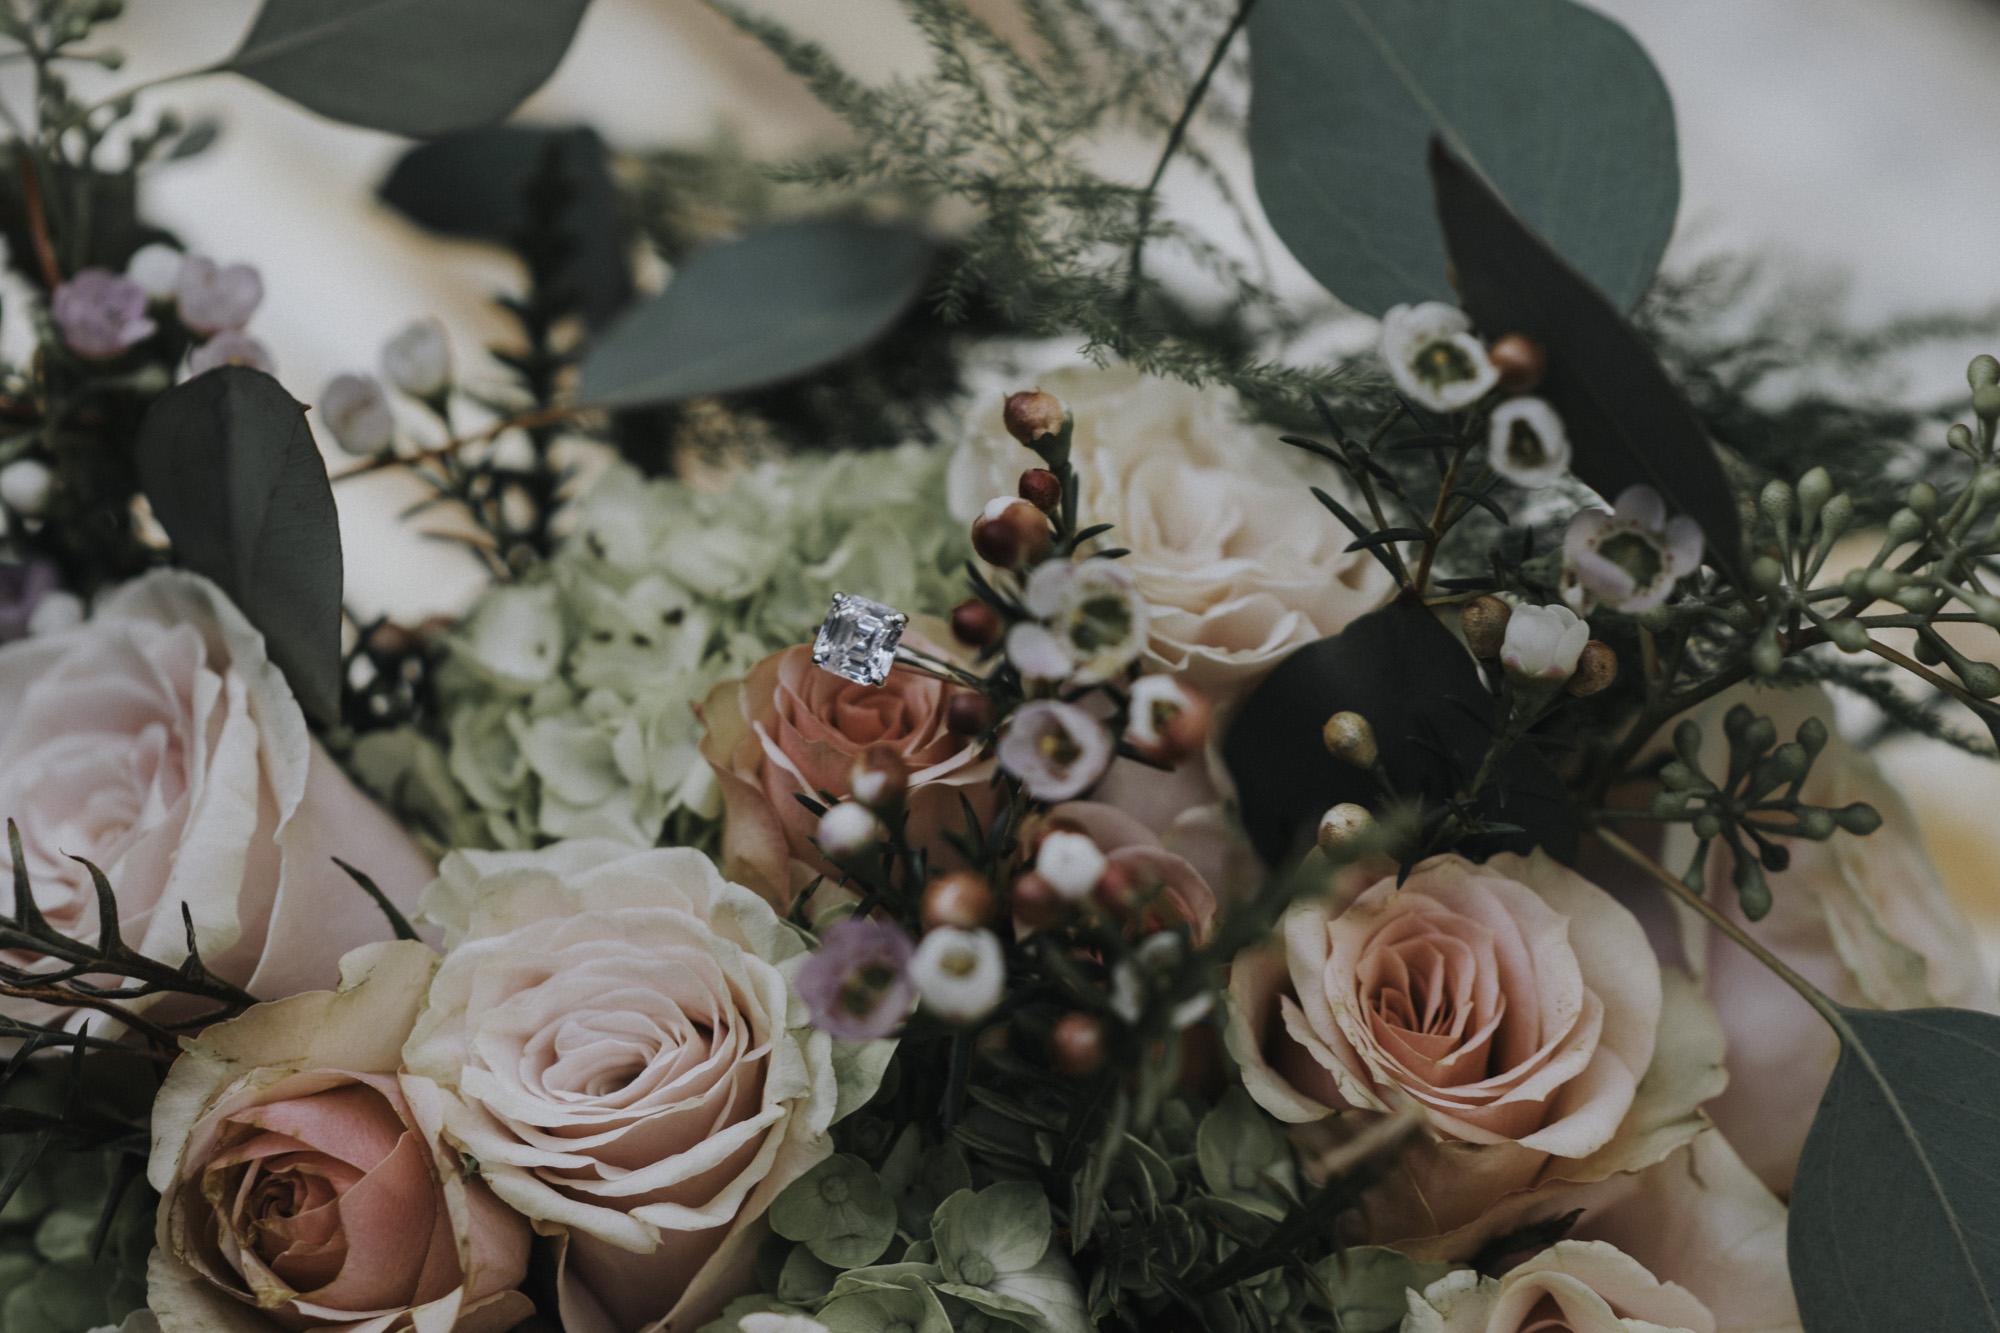 Cate_Ann_Photography_Dayton_Ohio_Wedding_Elopement_And_Engagement_PhotographerDSC_5668.jpg